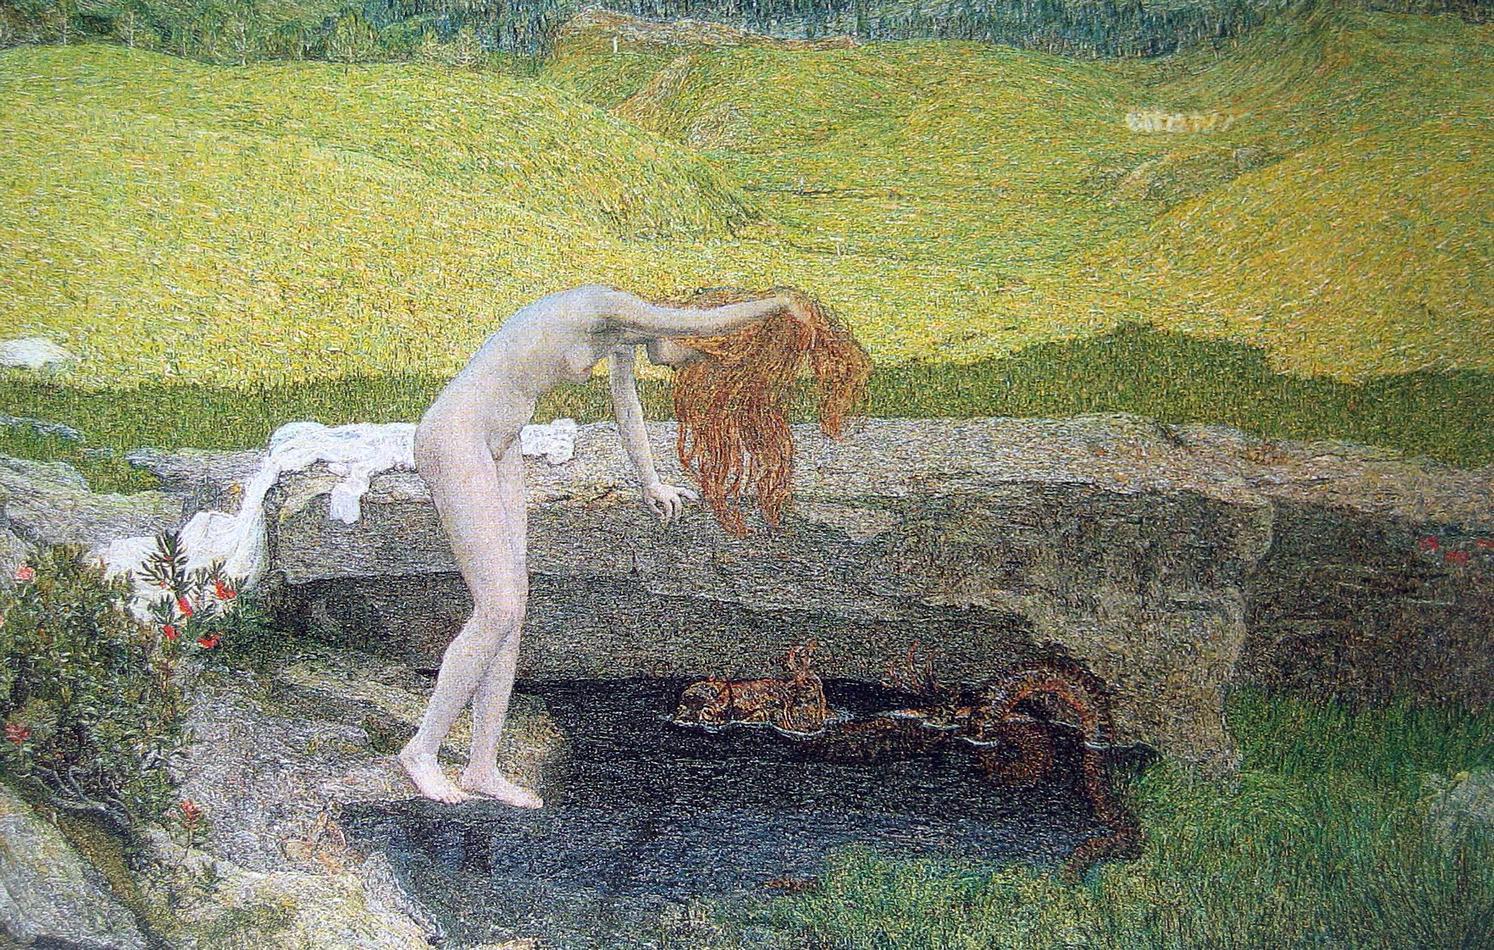 Segantini_Eitelkeit_1897.jpg